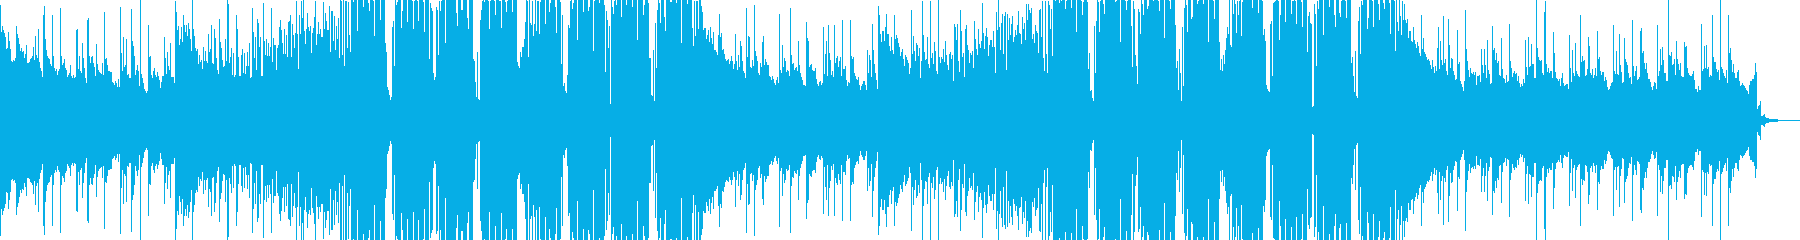 Future Bass 3の再生済みの波形